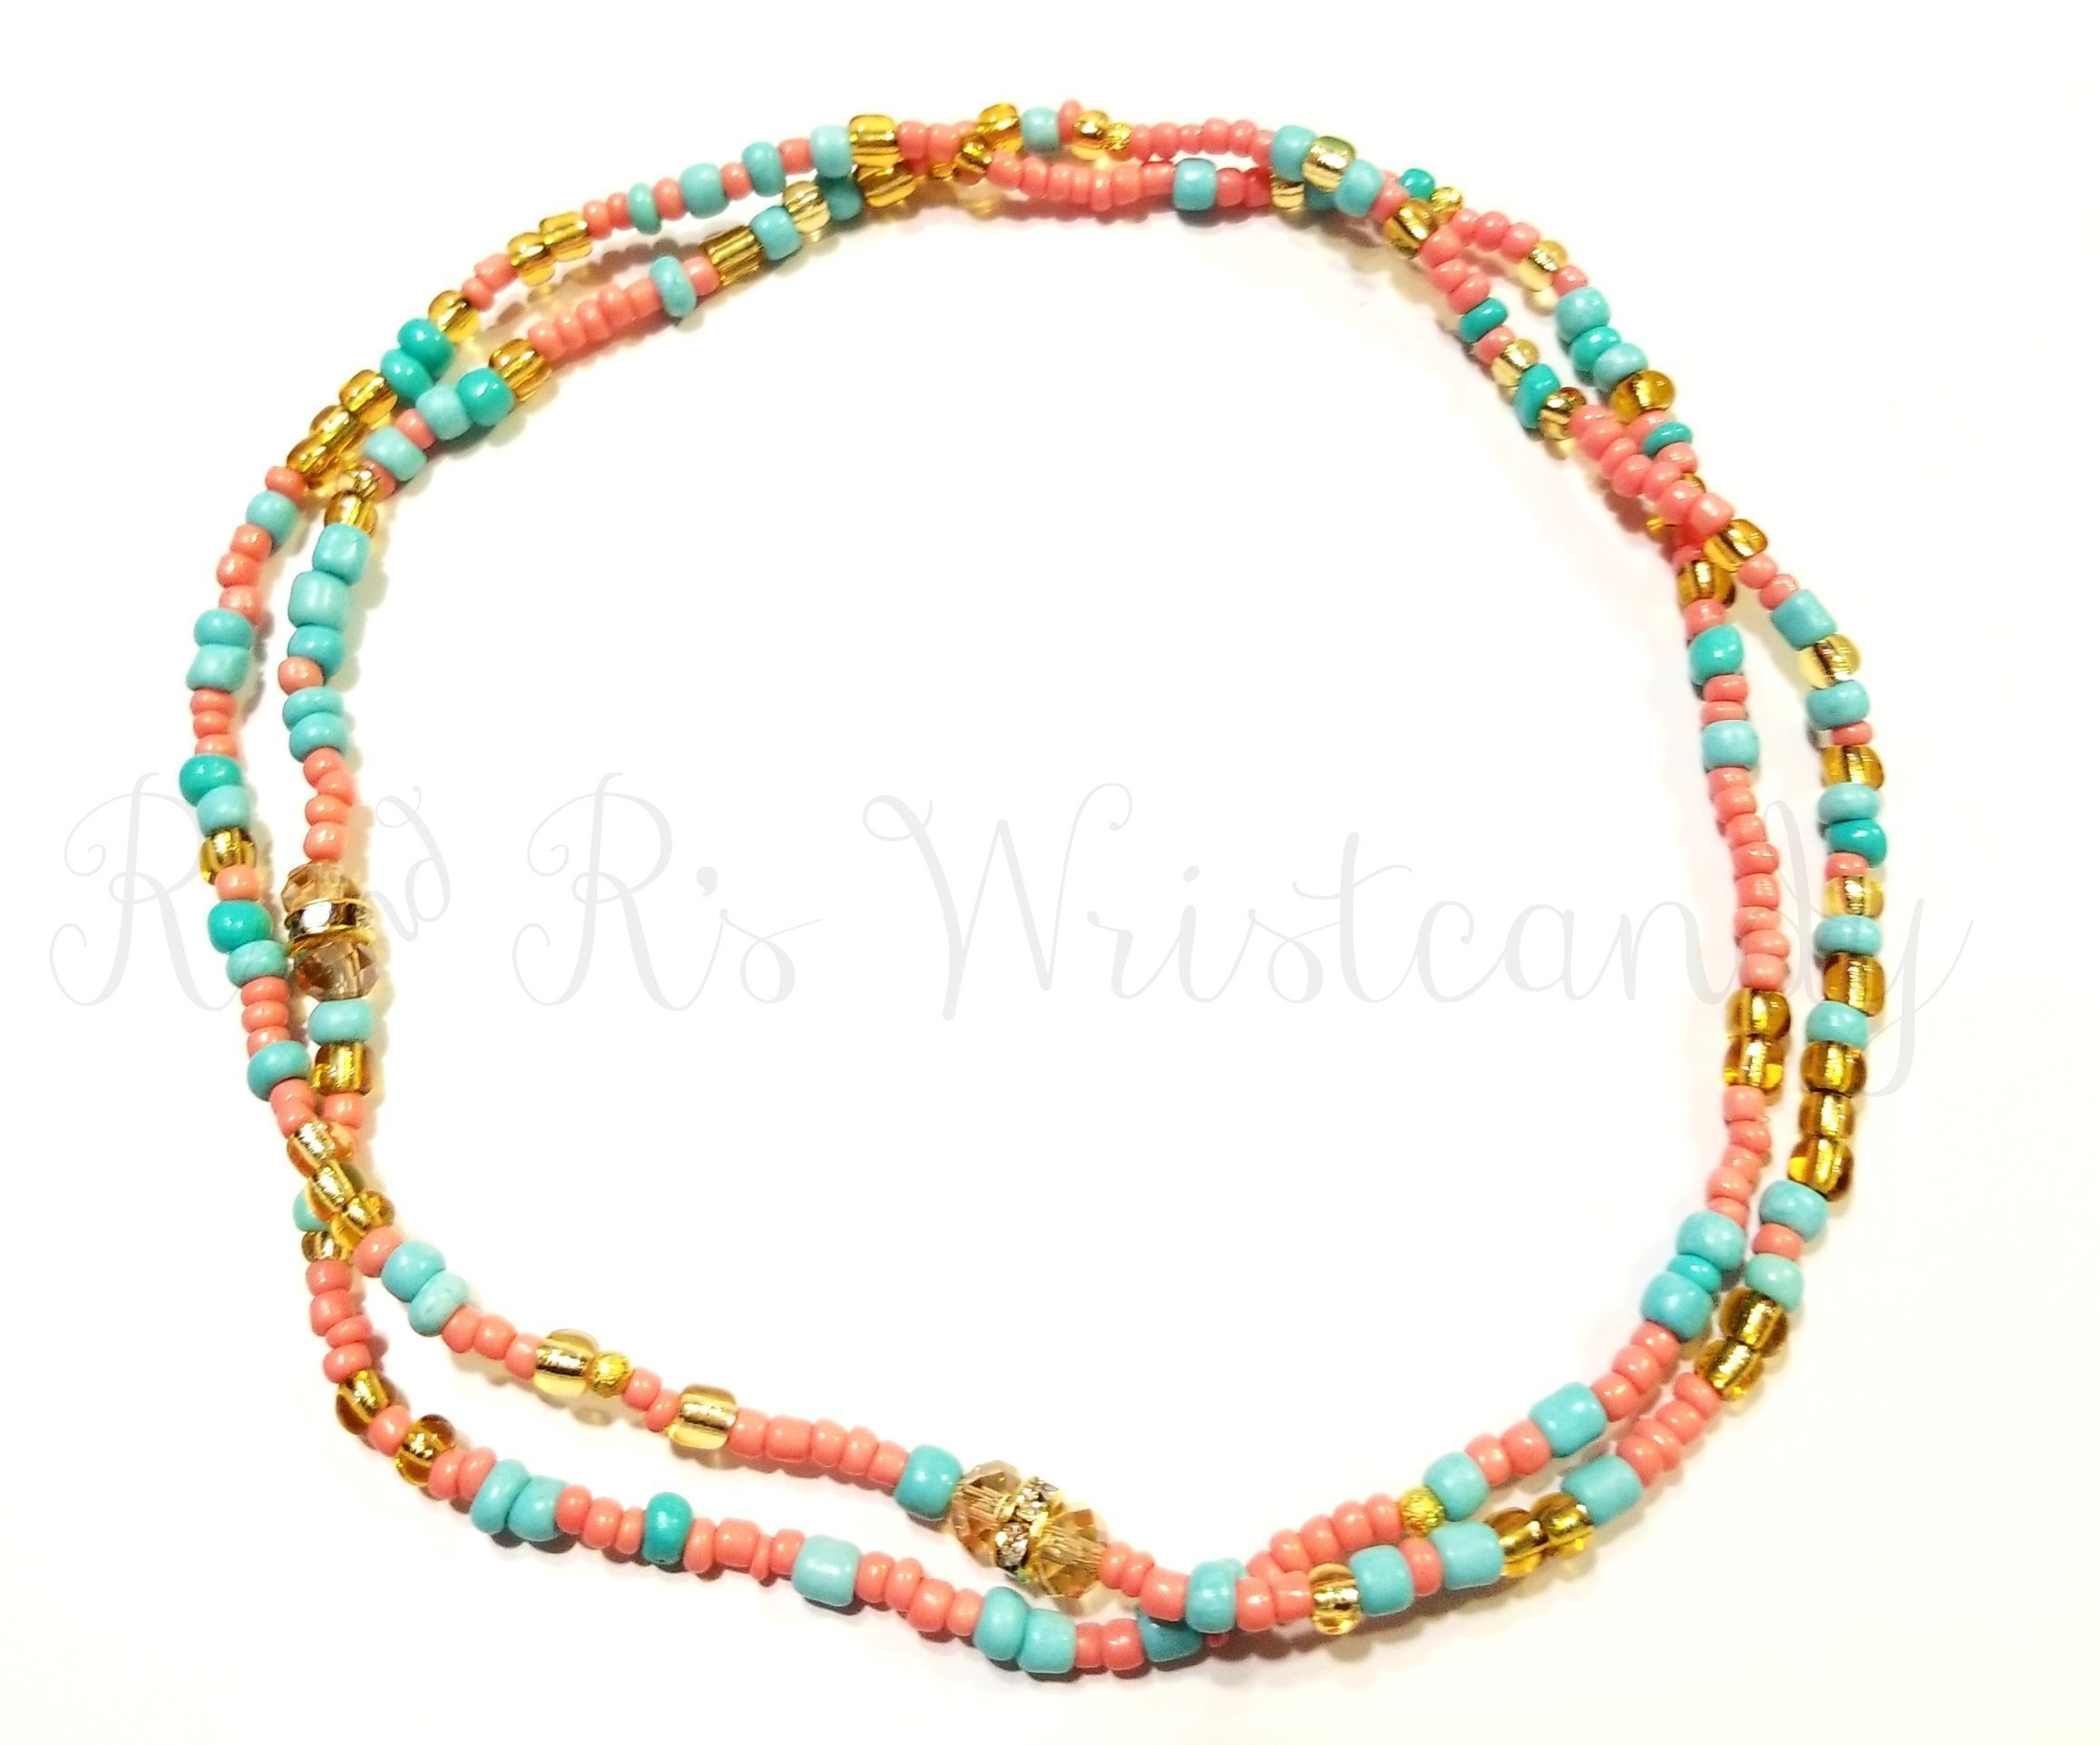 Waist Beads, Beaded Belly Chain, Seed Beads, African Waist Beads, Women's Jewelry, Body Jewelry, Minimalist Jewelry, Women's Body Jewelry, Stretch Bracelet